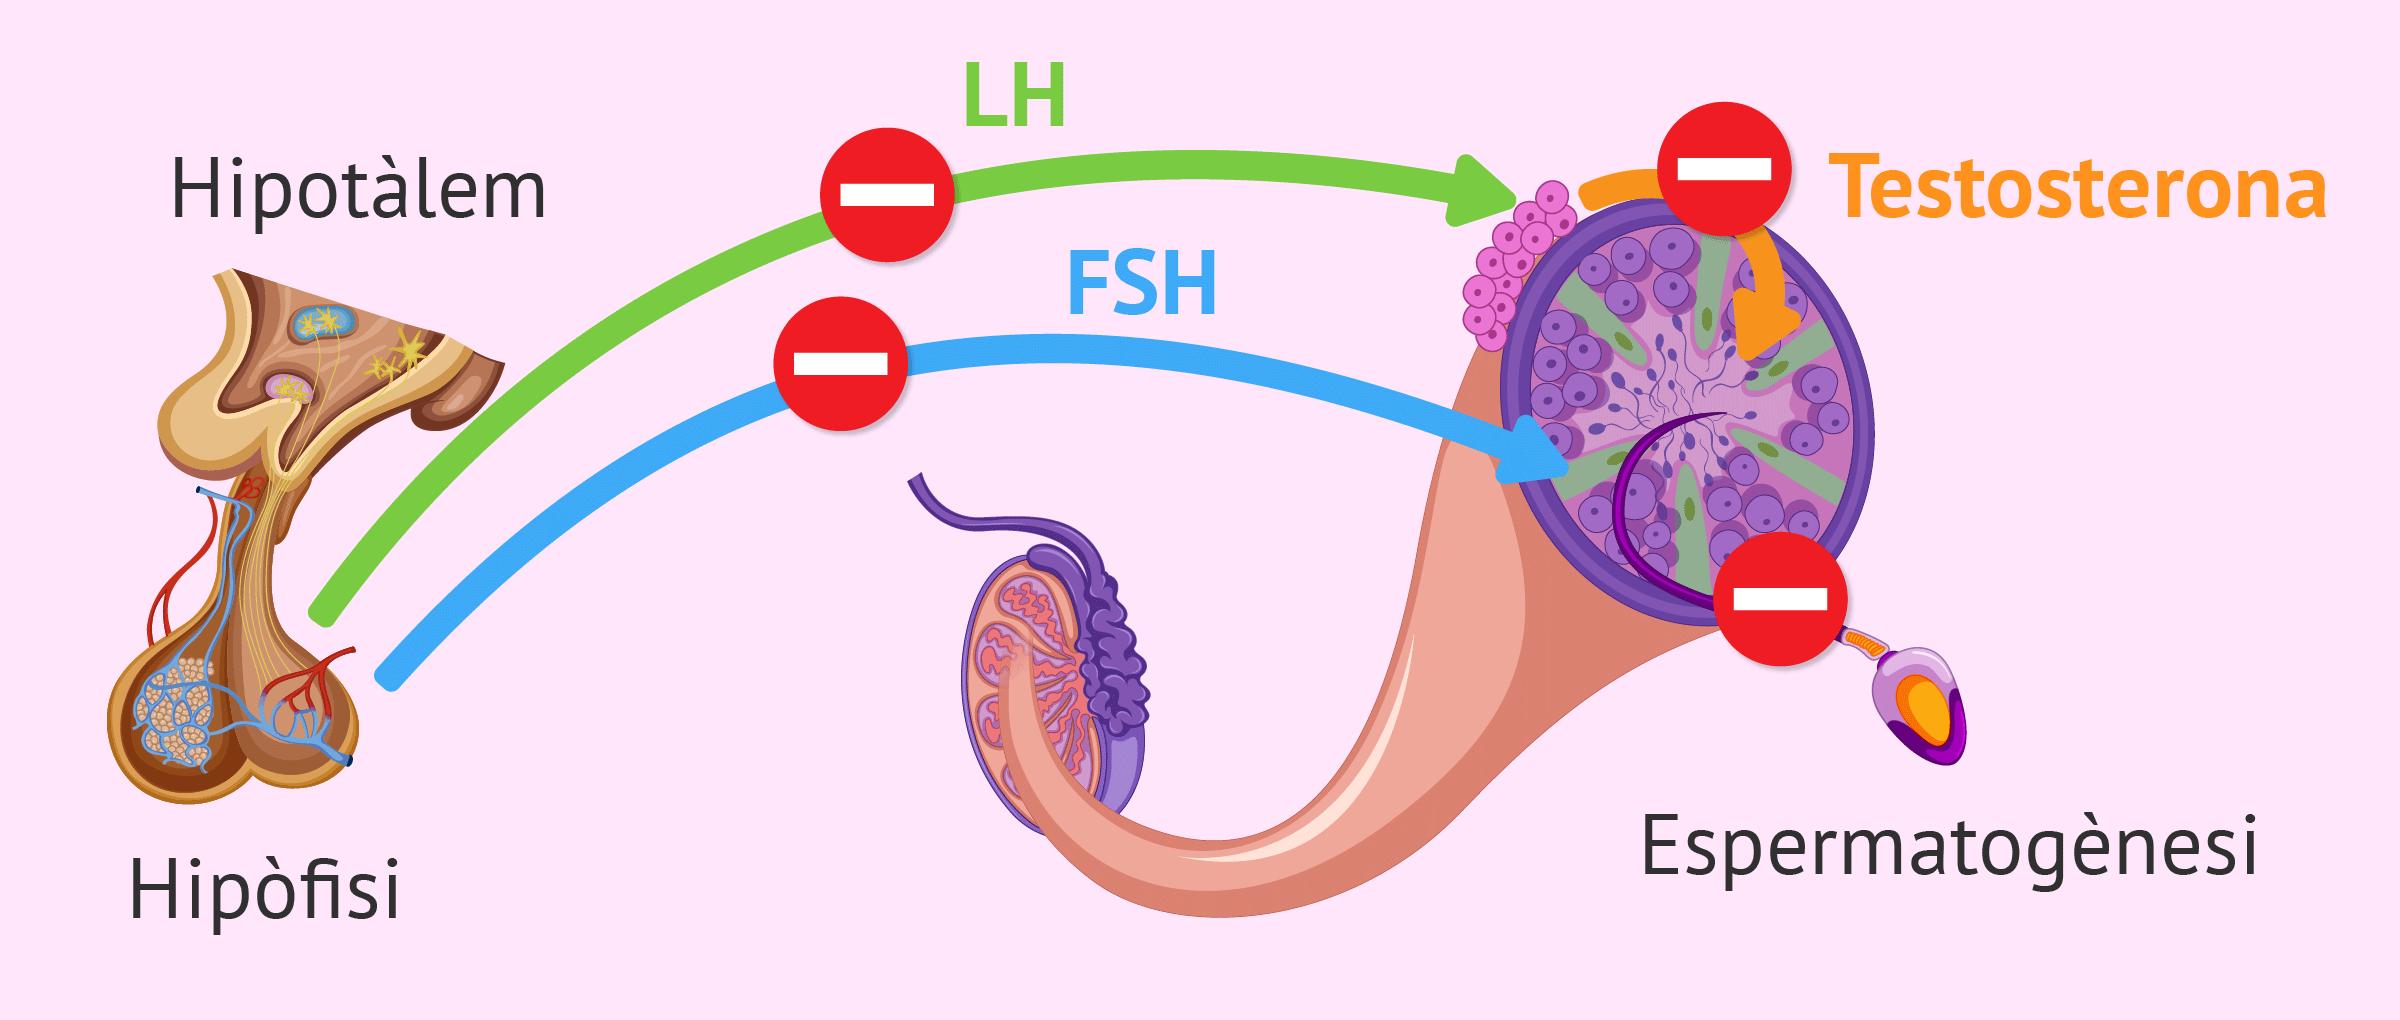 Factor endocrí d'esterilitat masculina